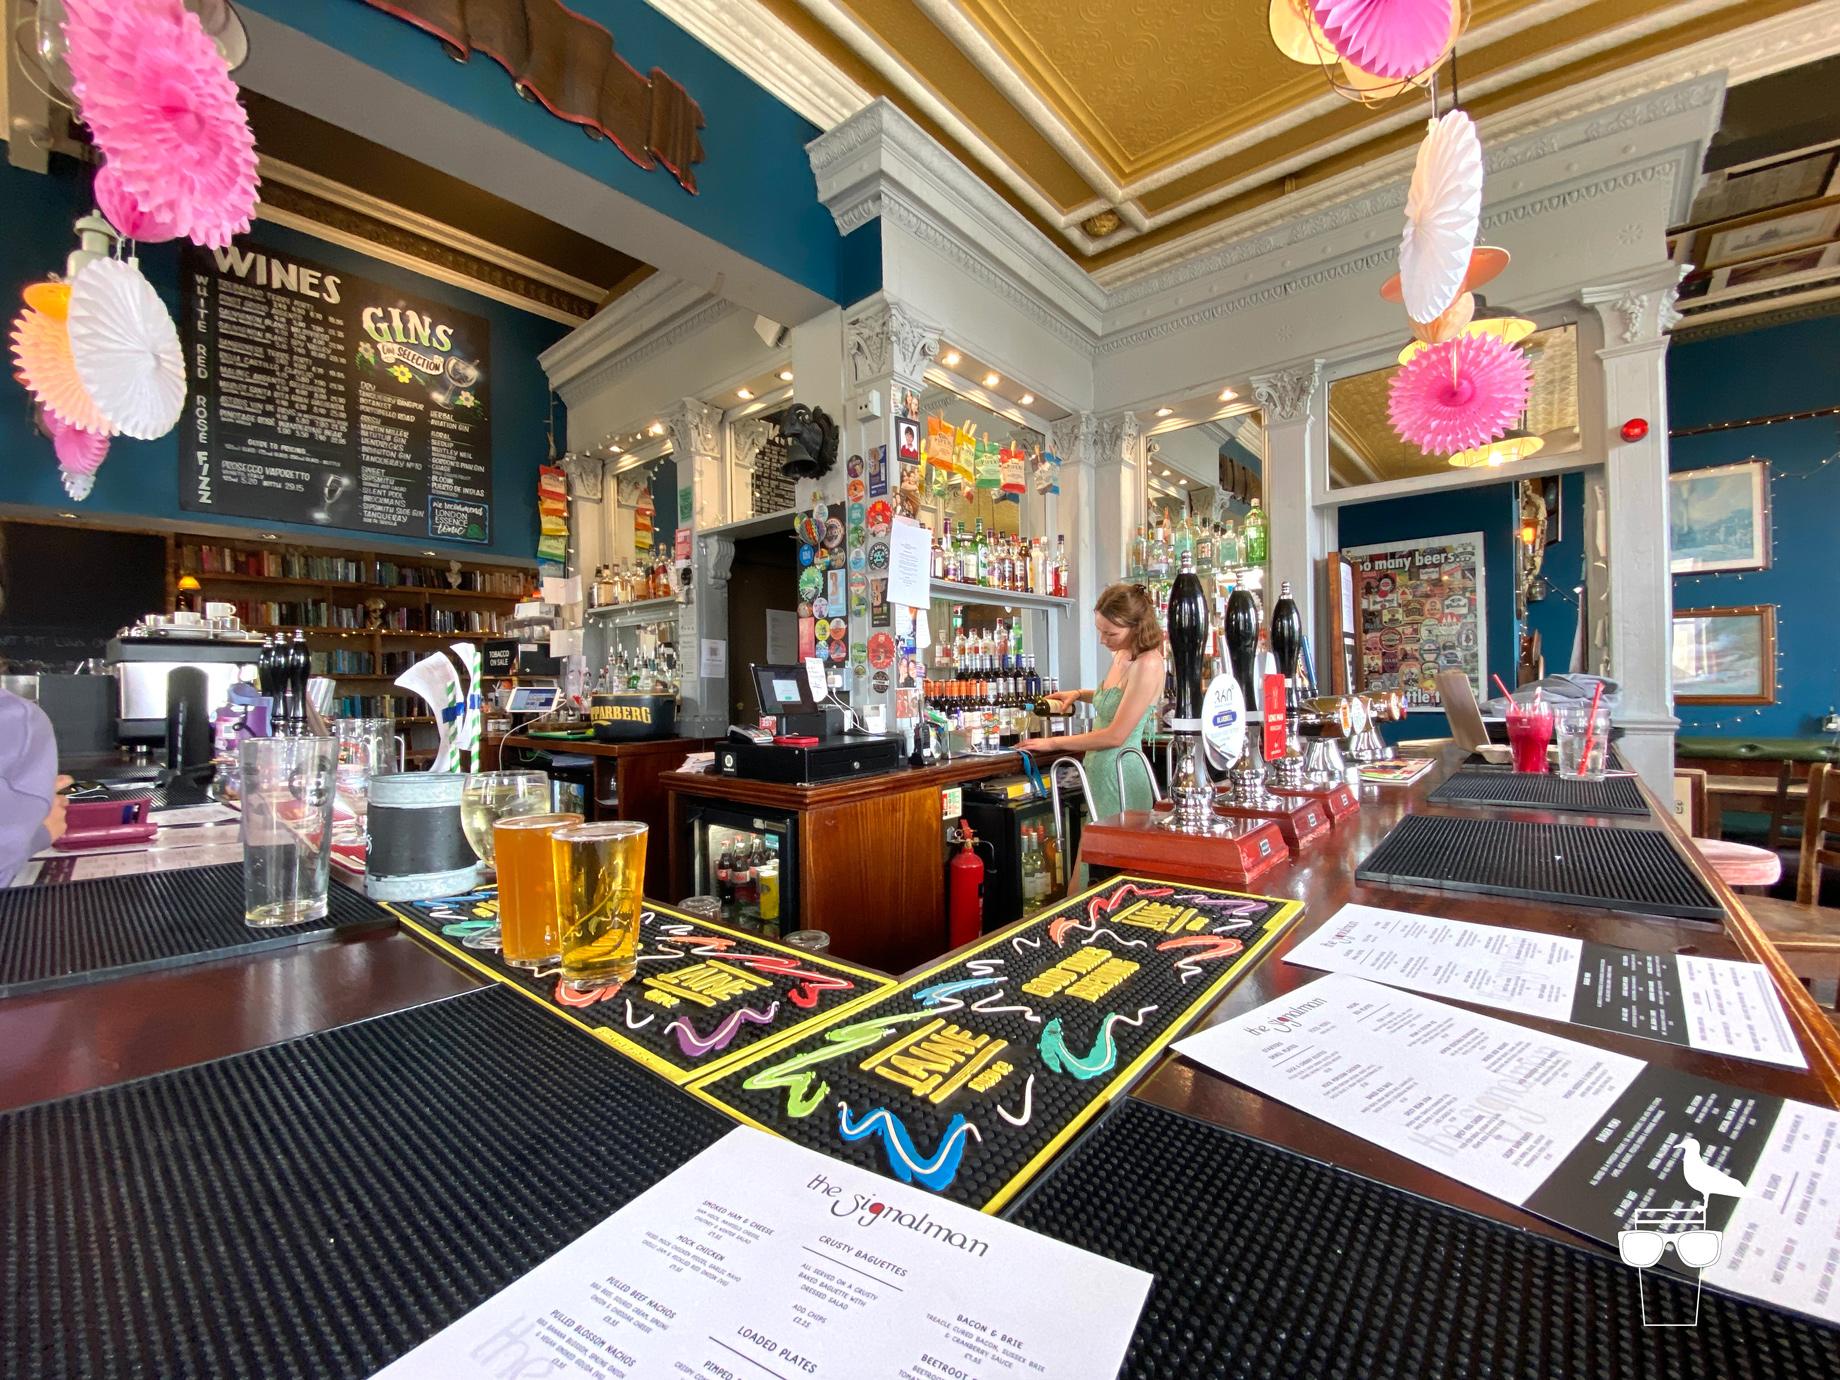 The Signalman Brighton pub garden